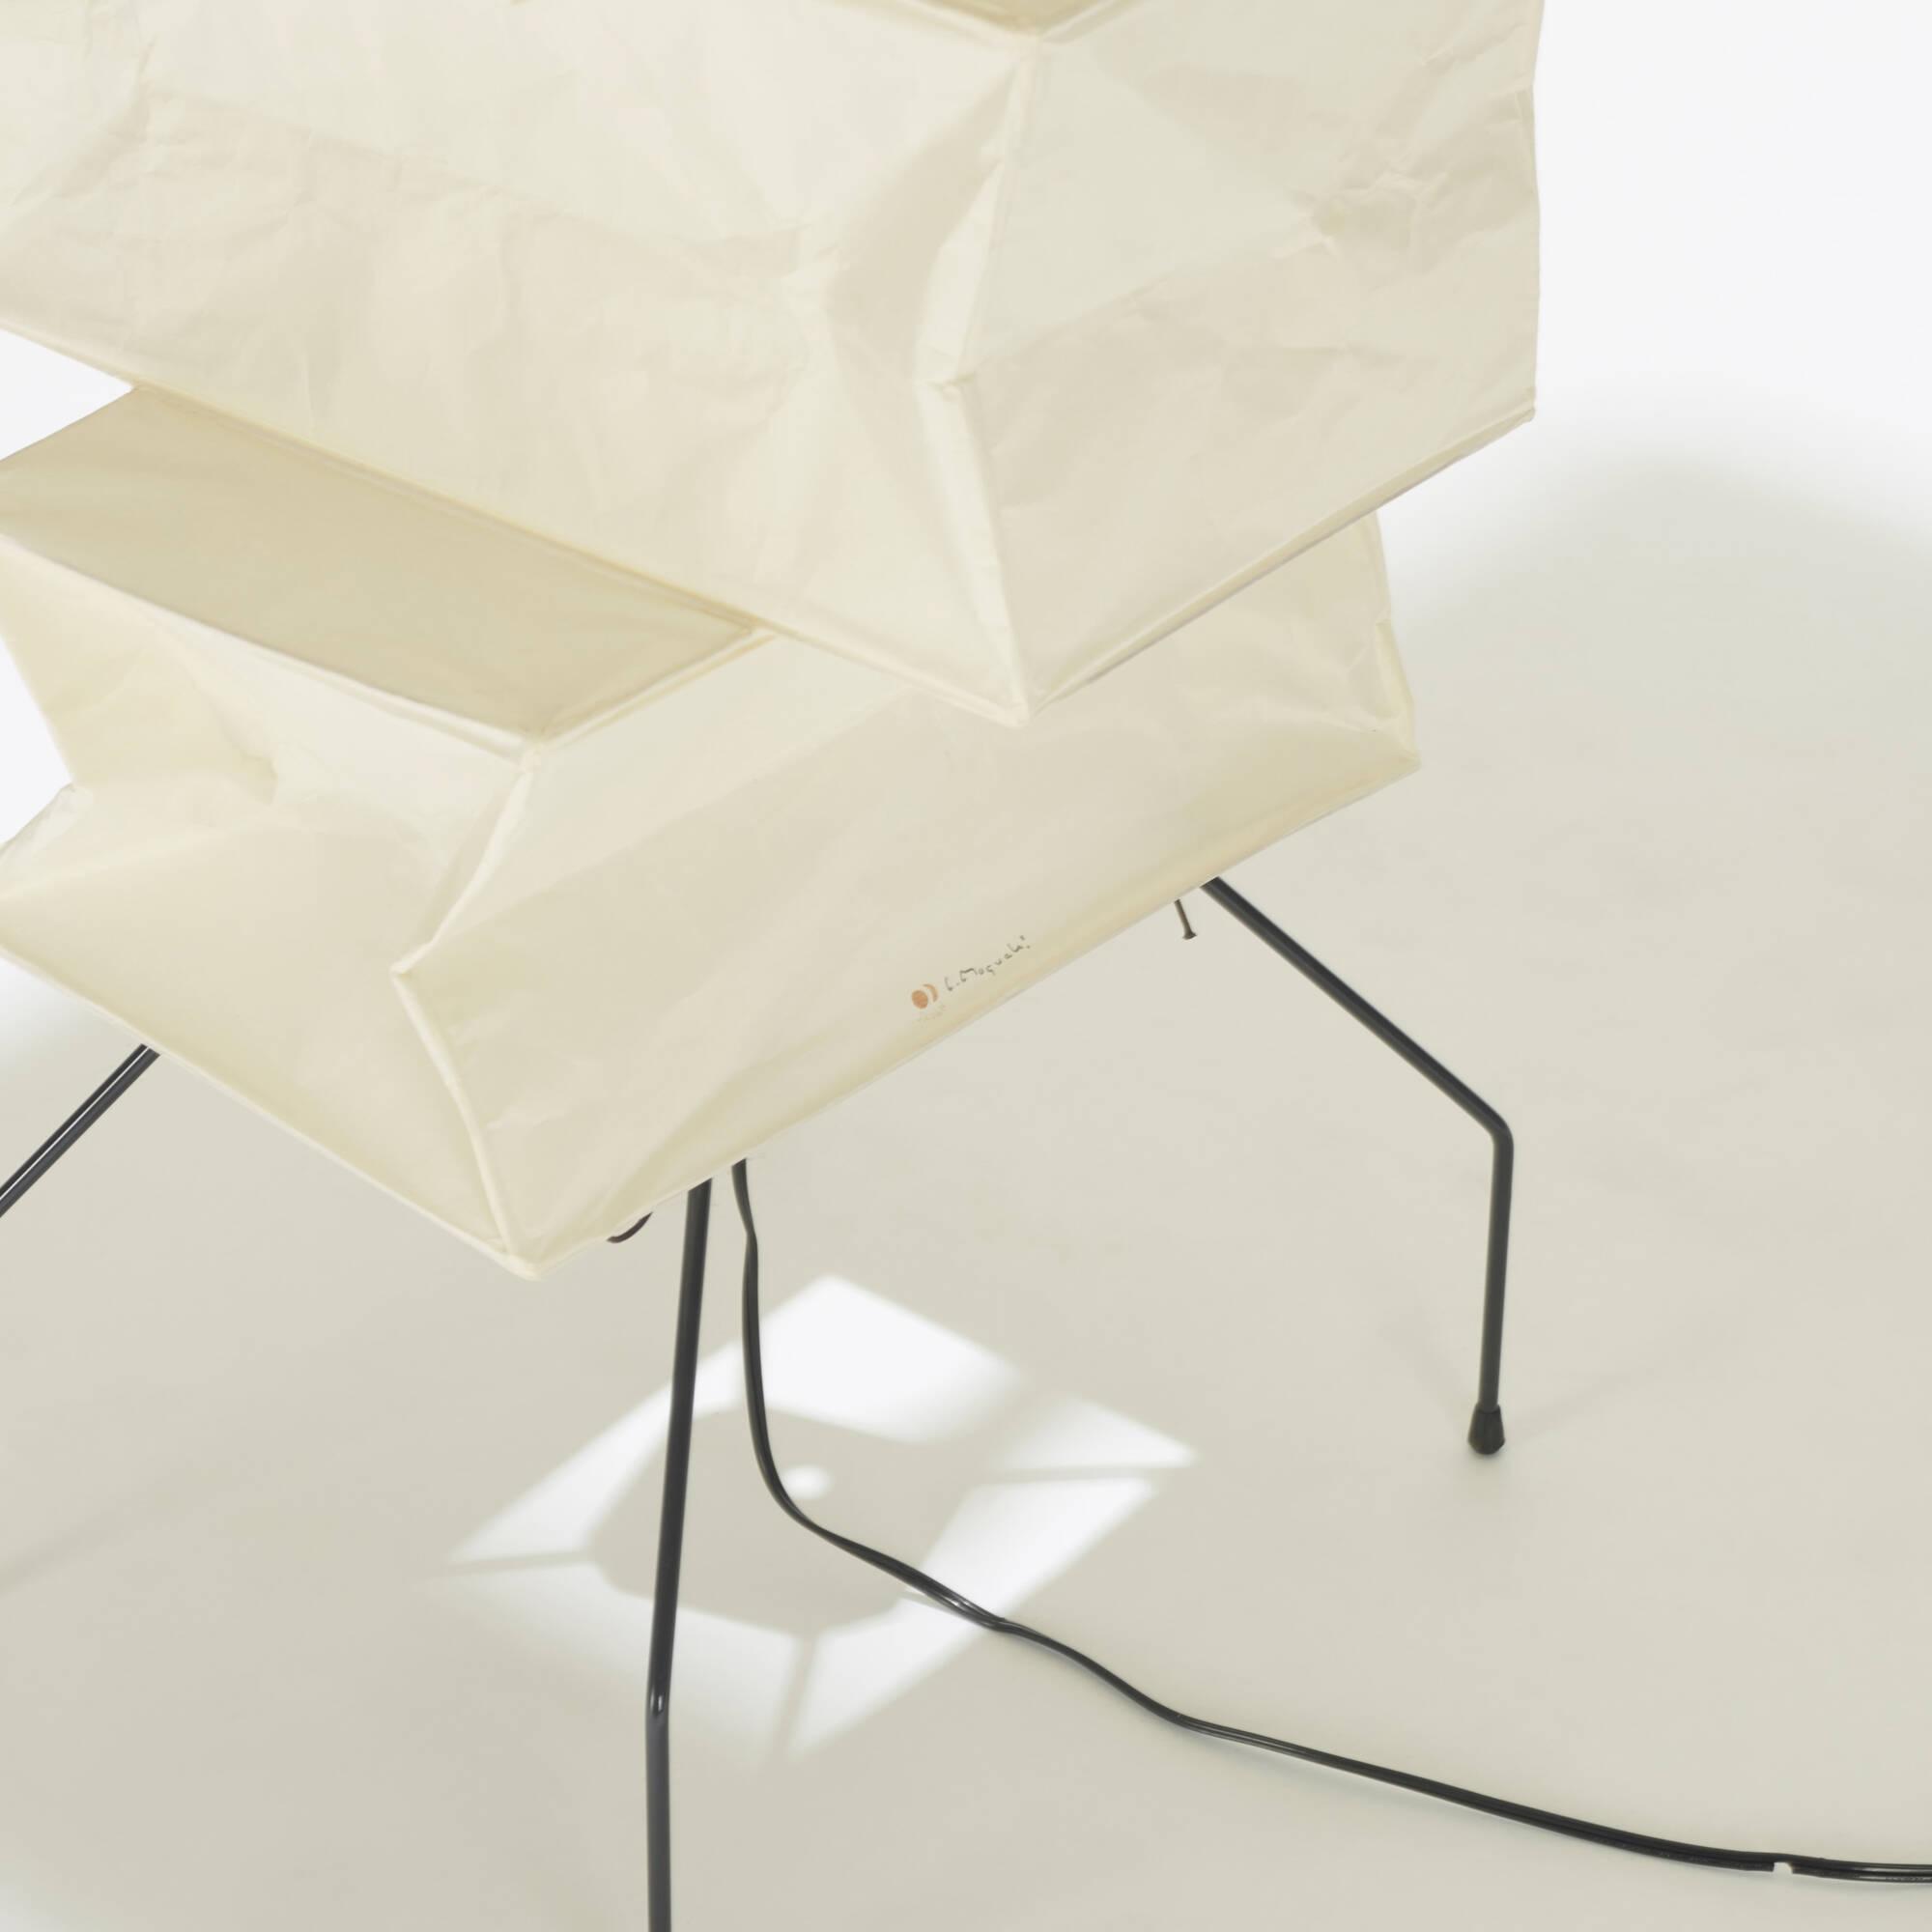 209: ISAMU NOGUCHI, Akari floor lamp, model UF4-L10 < American ...